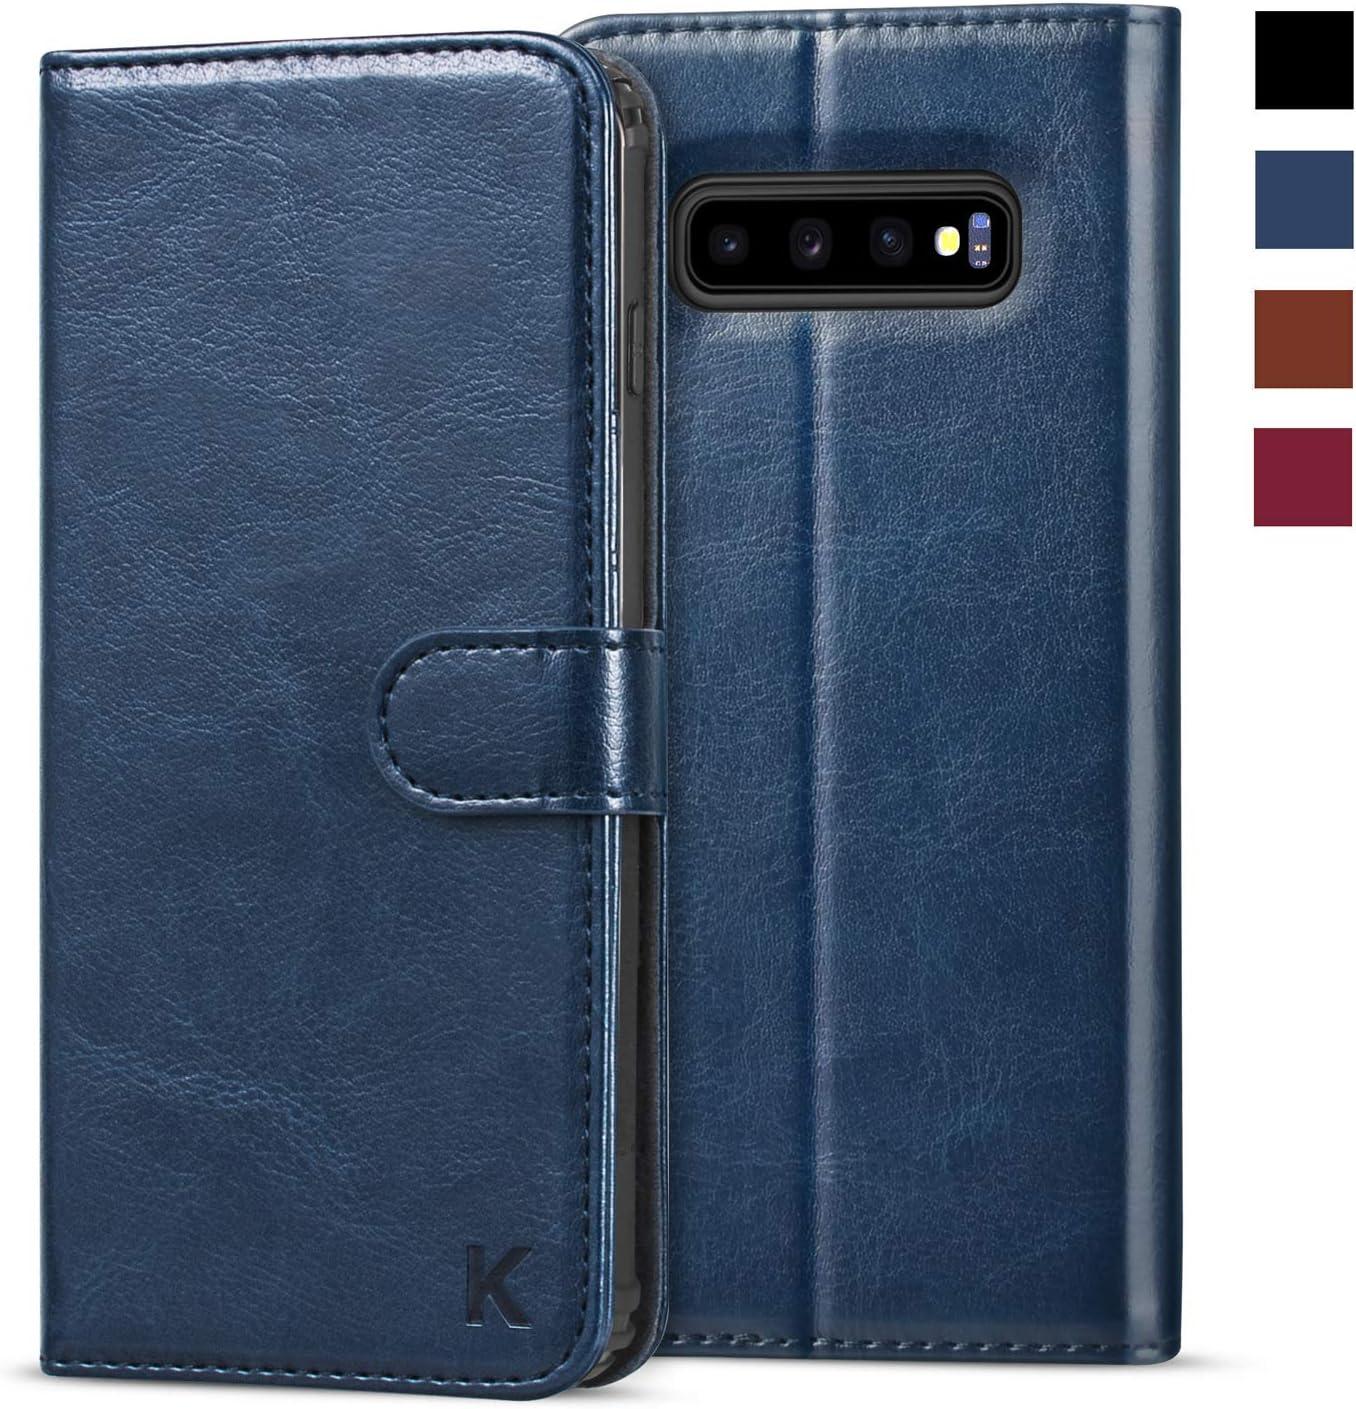 KILINO Galaxy S10 Plus Wallet Case [Premium Leather] [Soft TPU] [RFID Blocking] [Shock-Absorbent Bumper] [Card Slots] [Kickstand] [Magnetic Closure] Flip Folio Cover for Samsung Galaxy S10+ (Blue)